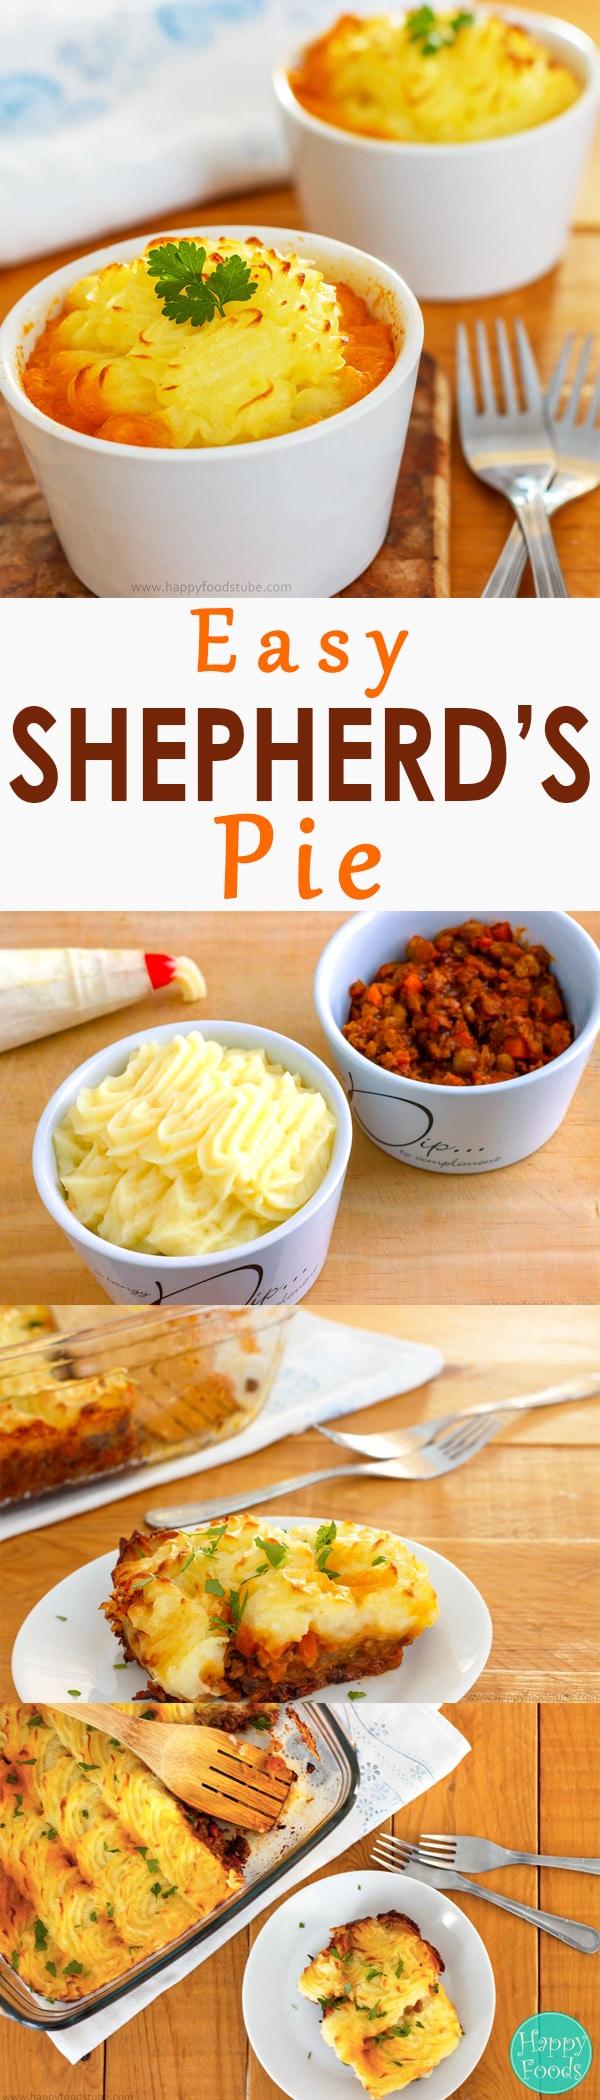 Easy Shepherd's Pie Recipe - Real comfort food, family favorite ...